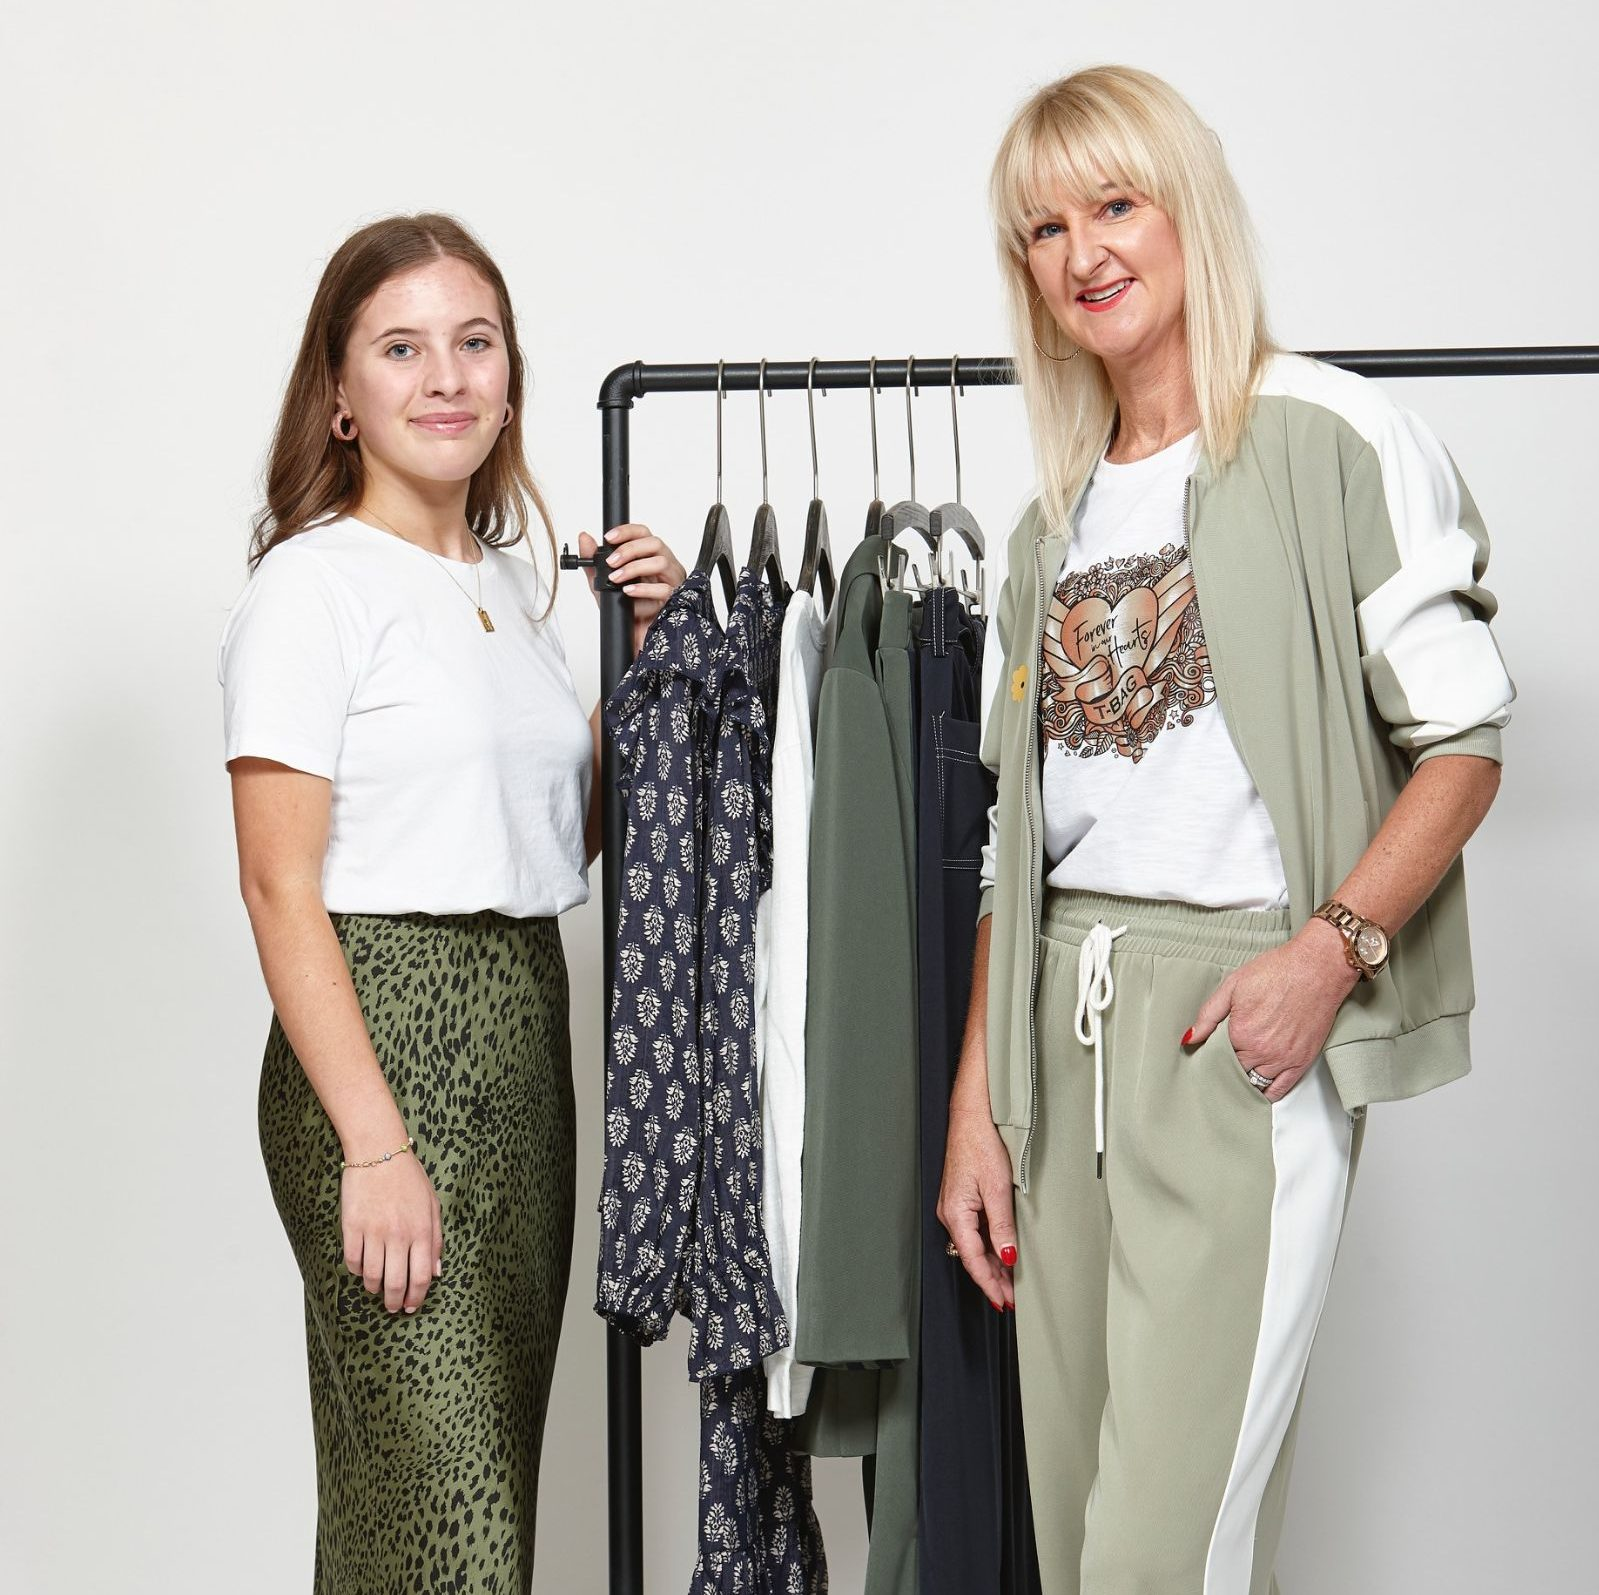 fashion internship jenny and ella